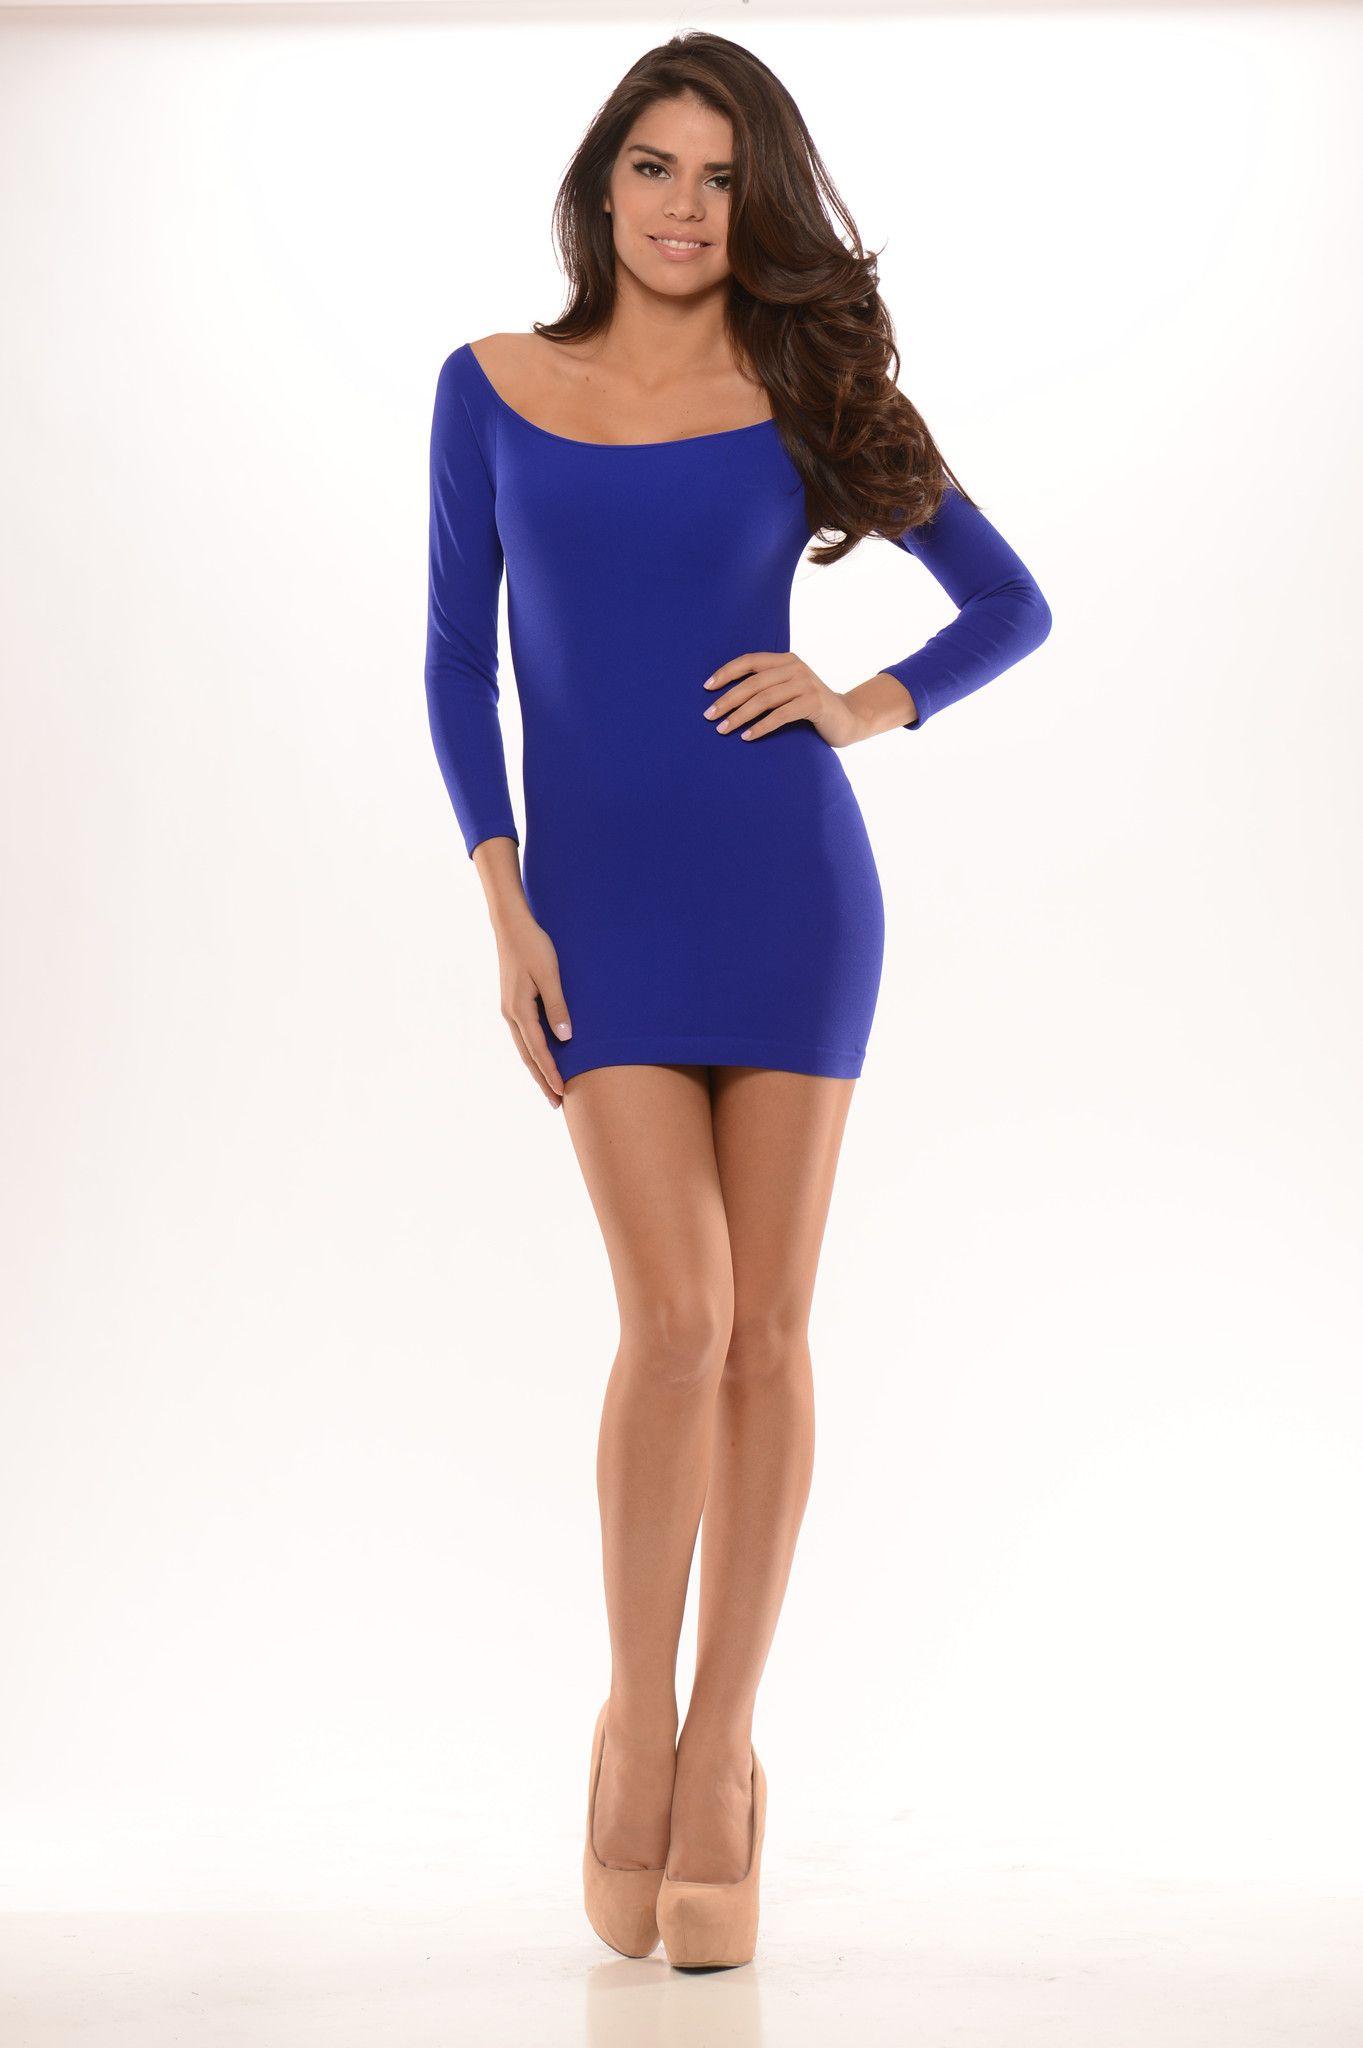 Long Sleeve Fitting Mini Dress - Royal Blue